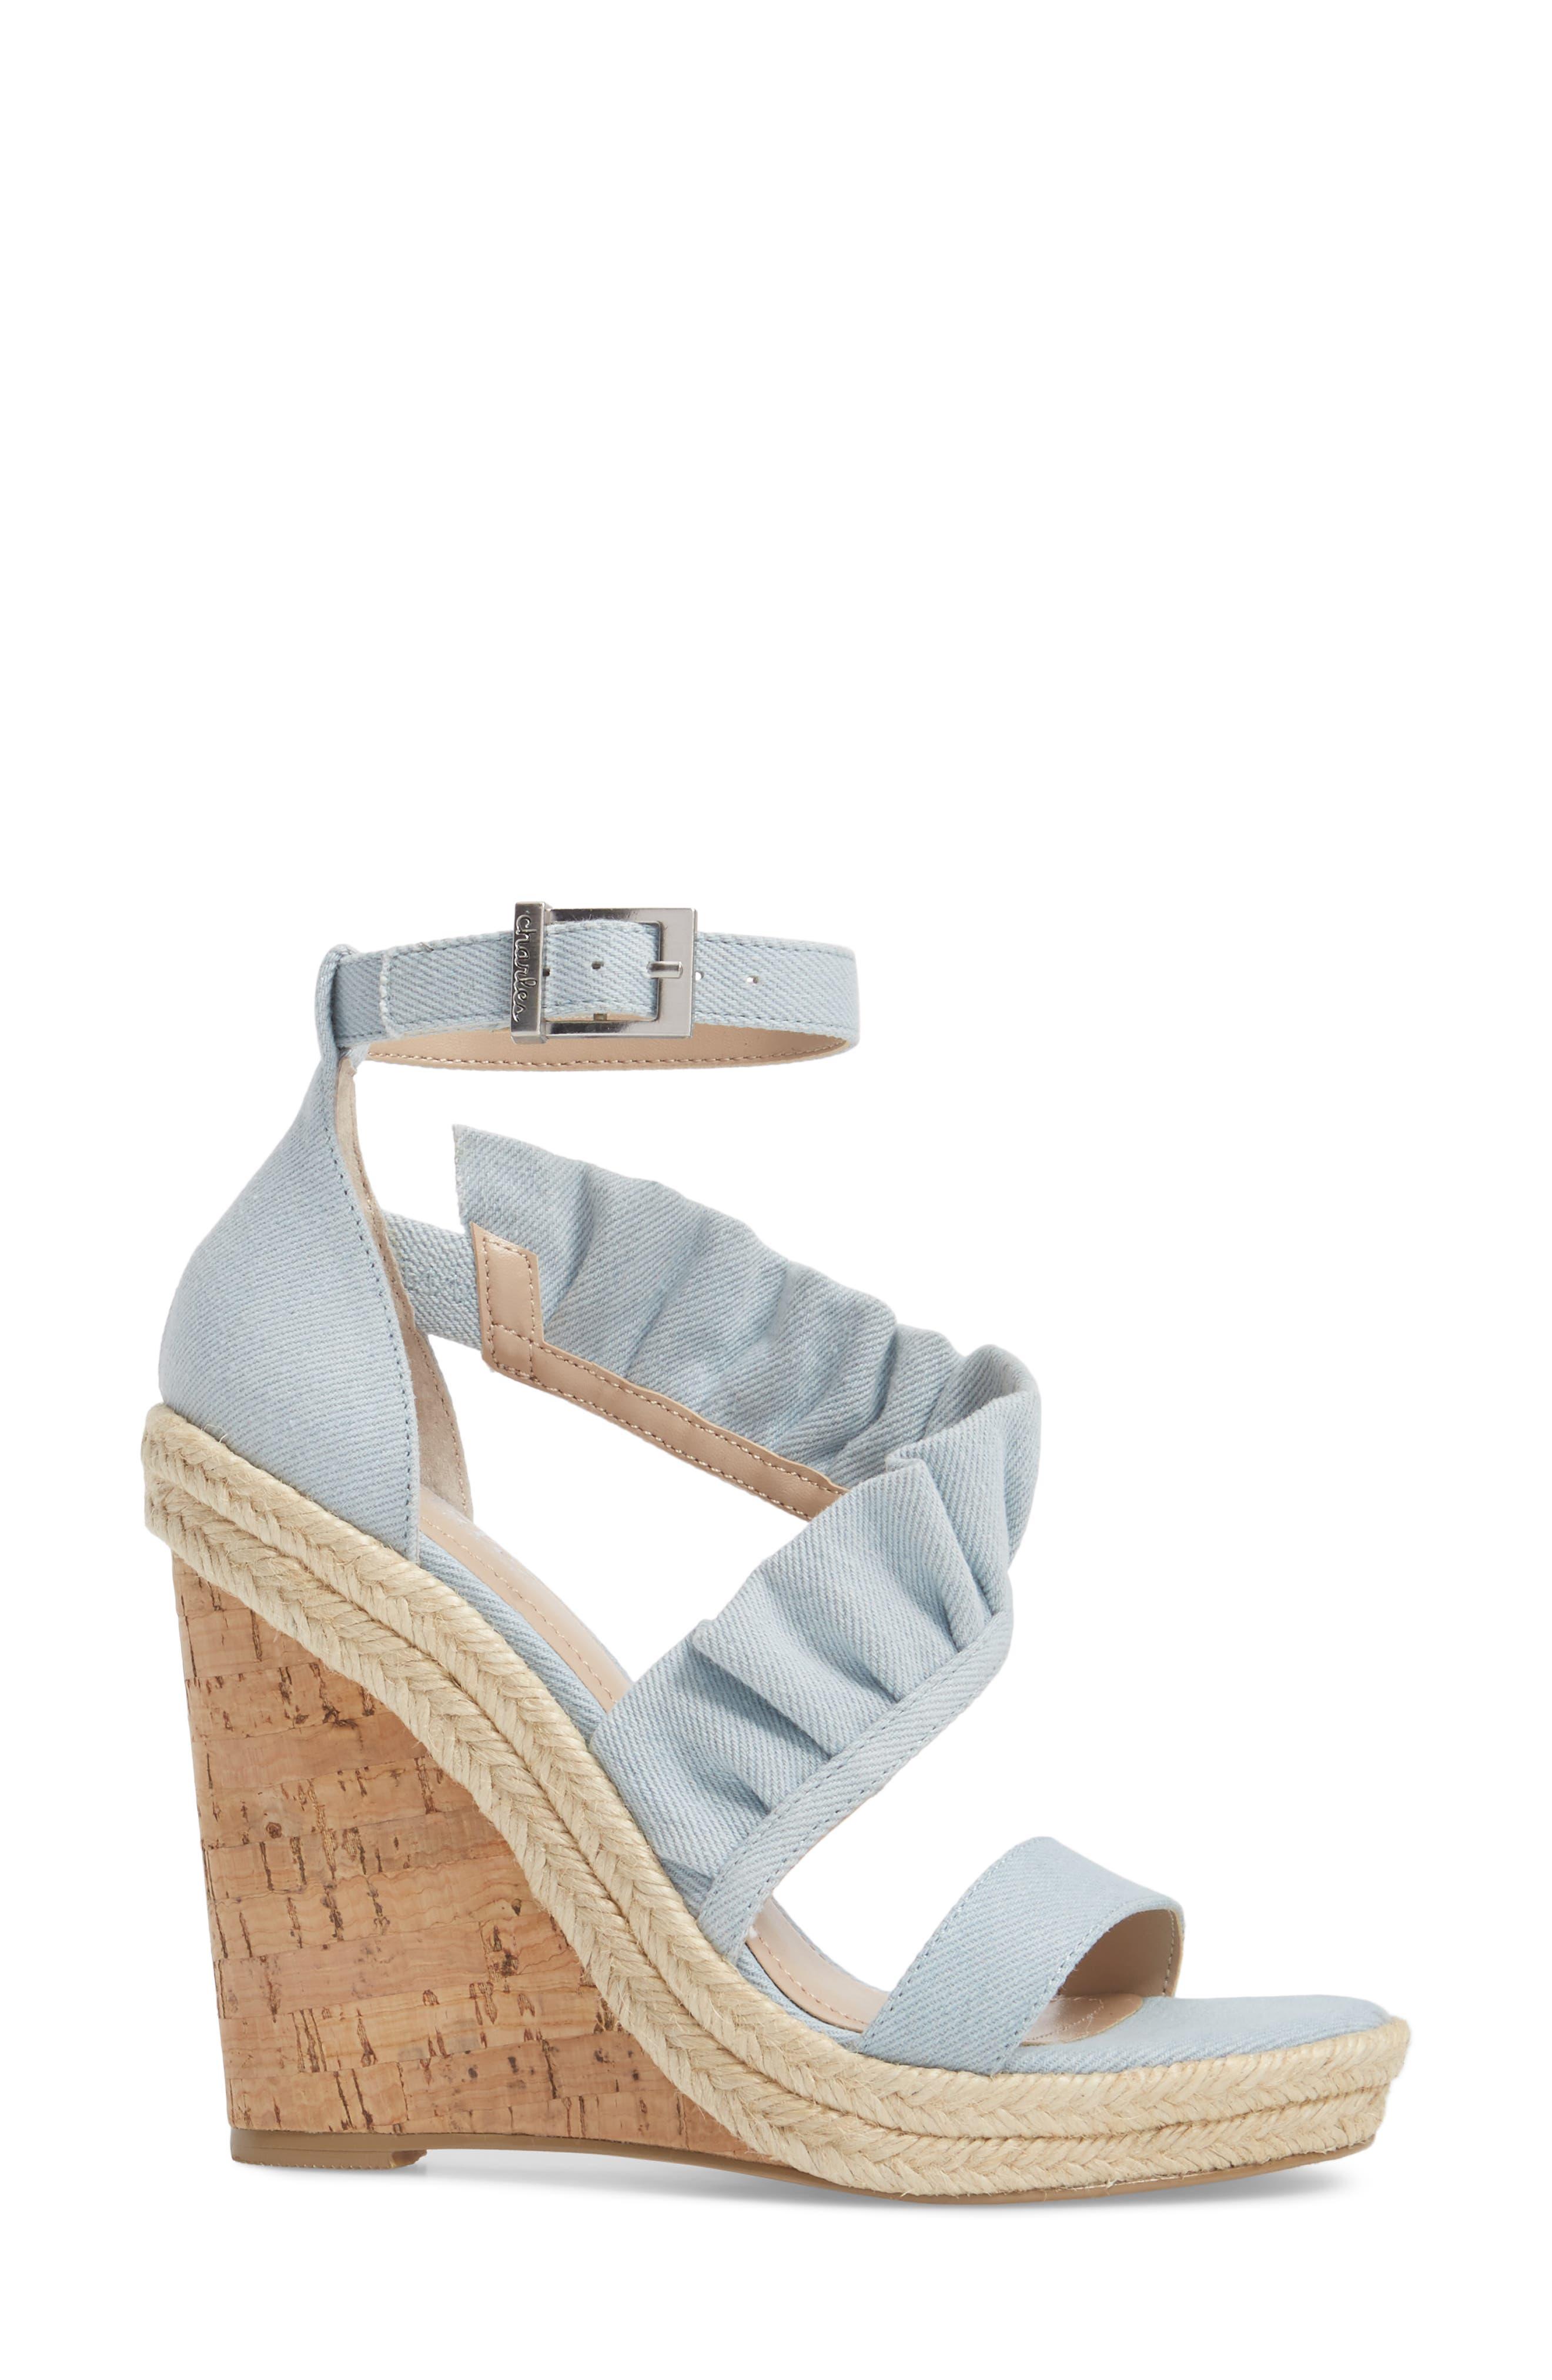 Brooke Espadrille Wedge Sandal,                             Alternate thumbnail 3, color,                             Light Blue Denim